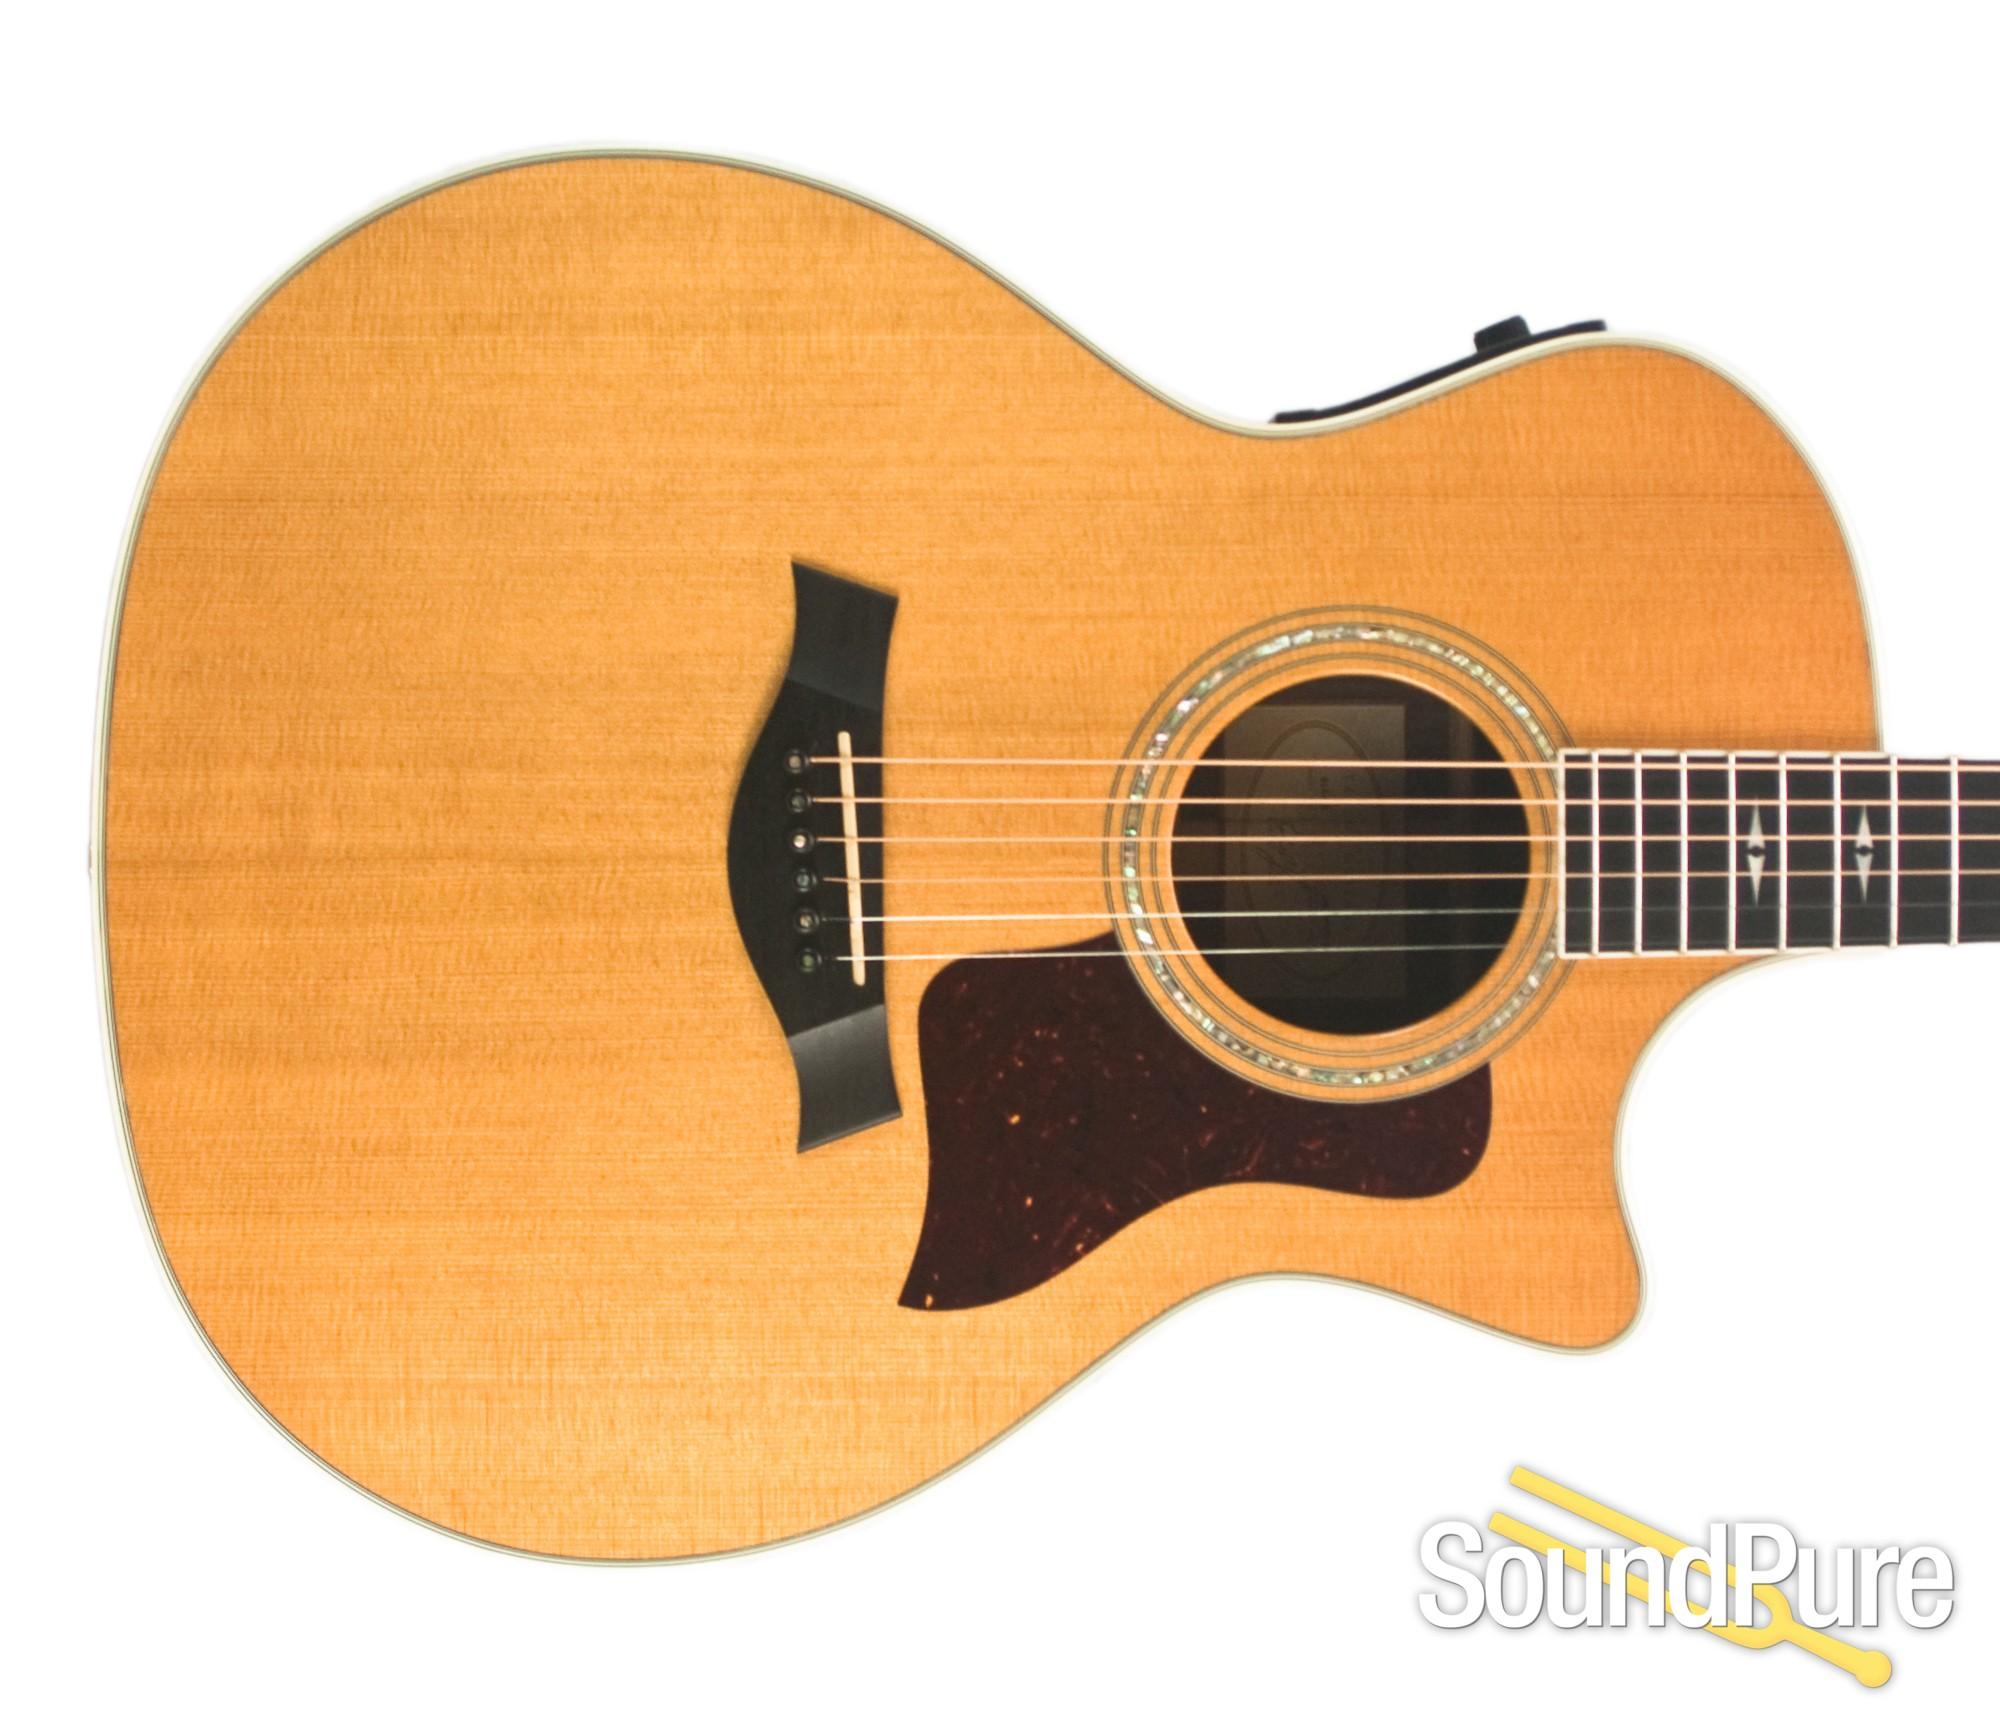 taylor 814ce grand auditorium acoustic guitar used ebay. Black Bedroom Furniture Sets. Home Design Ideas